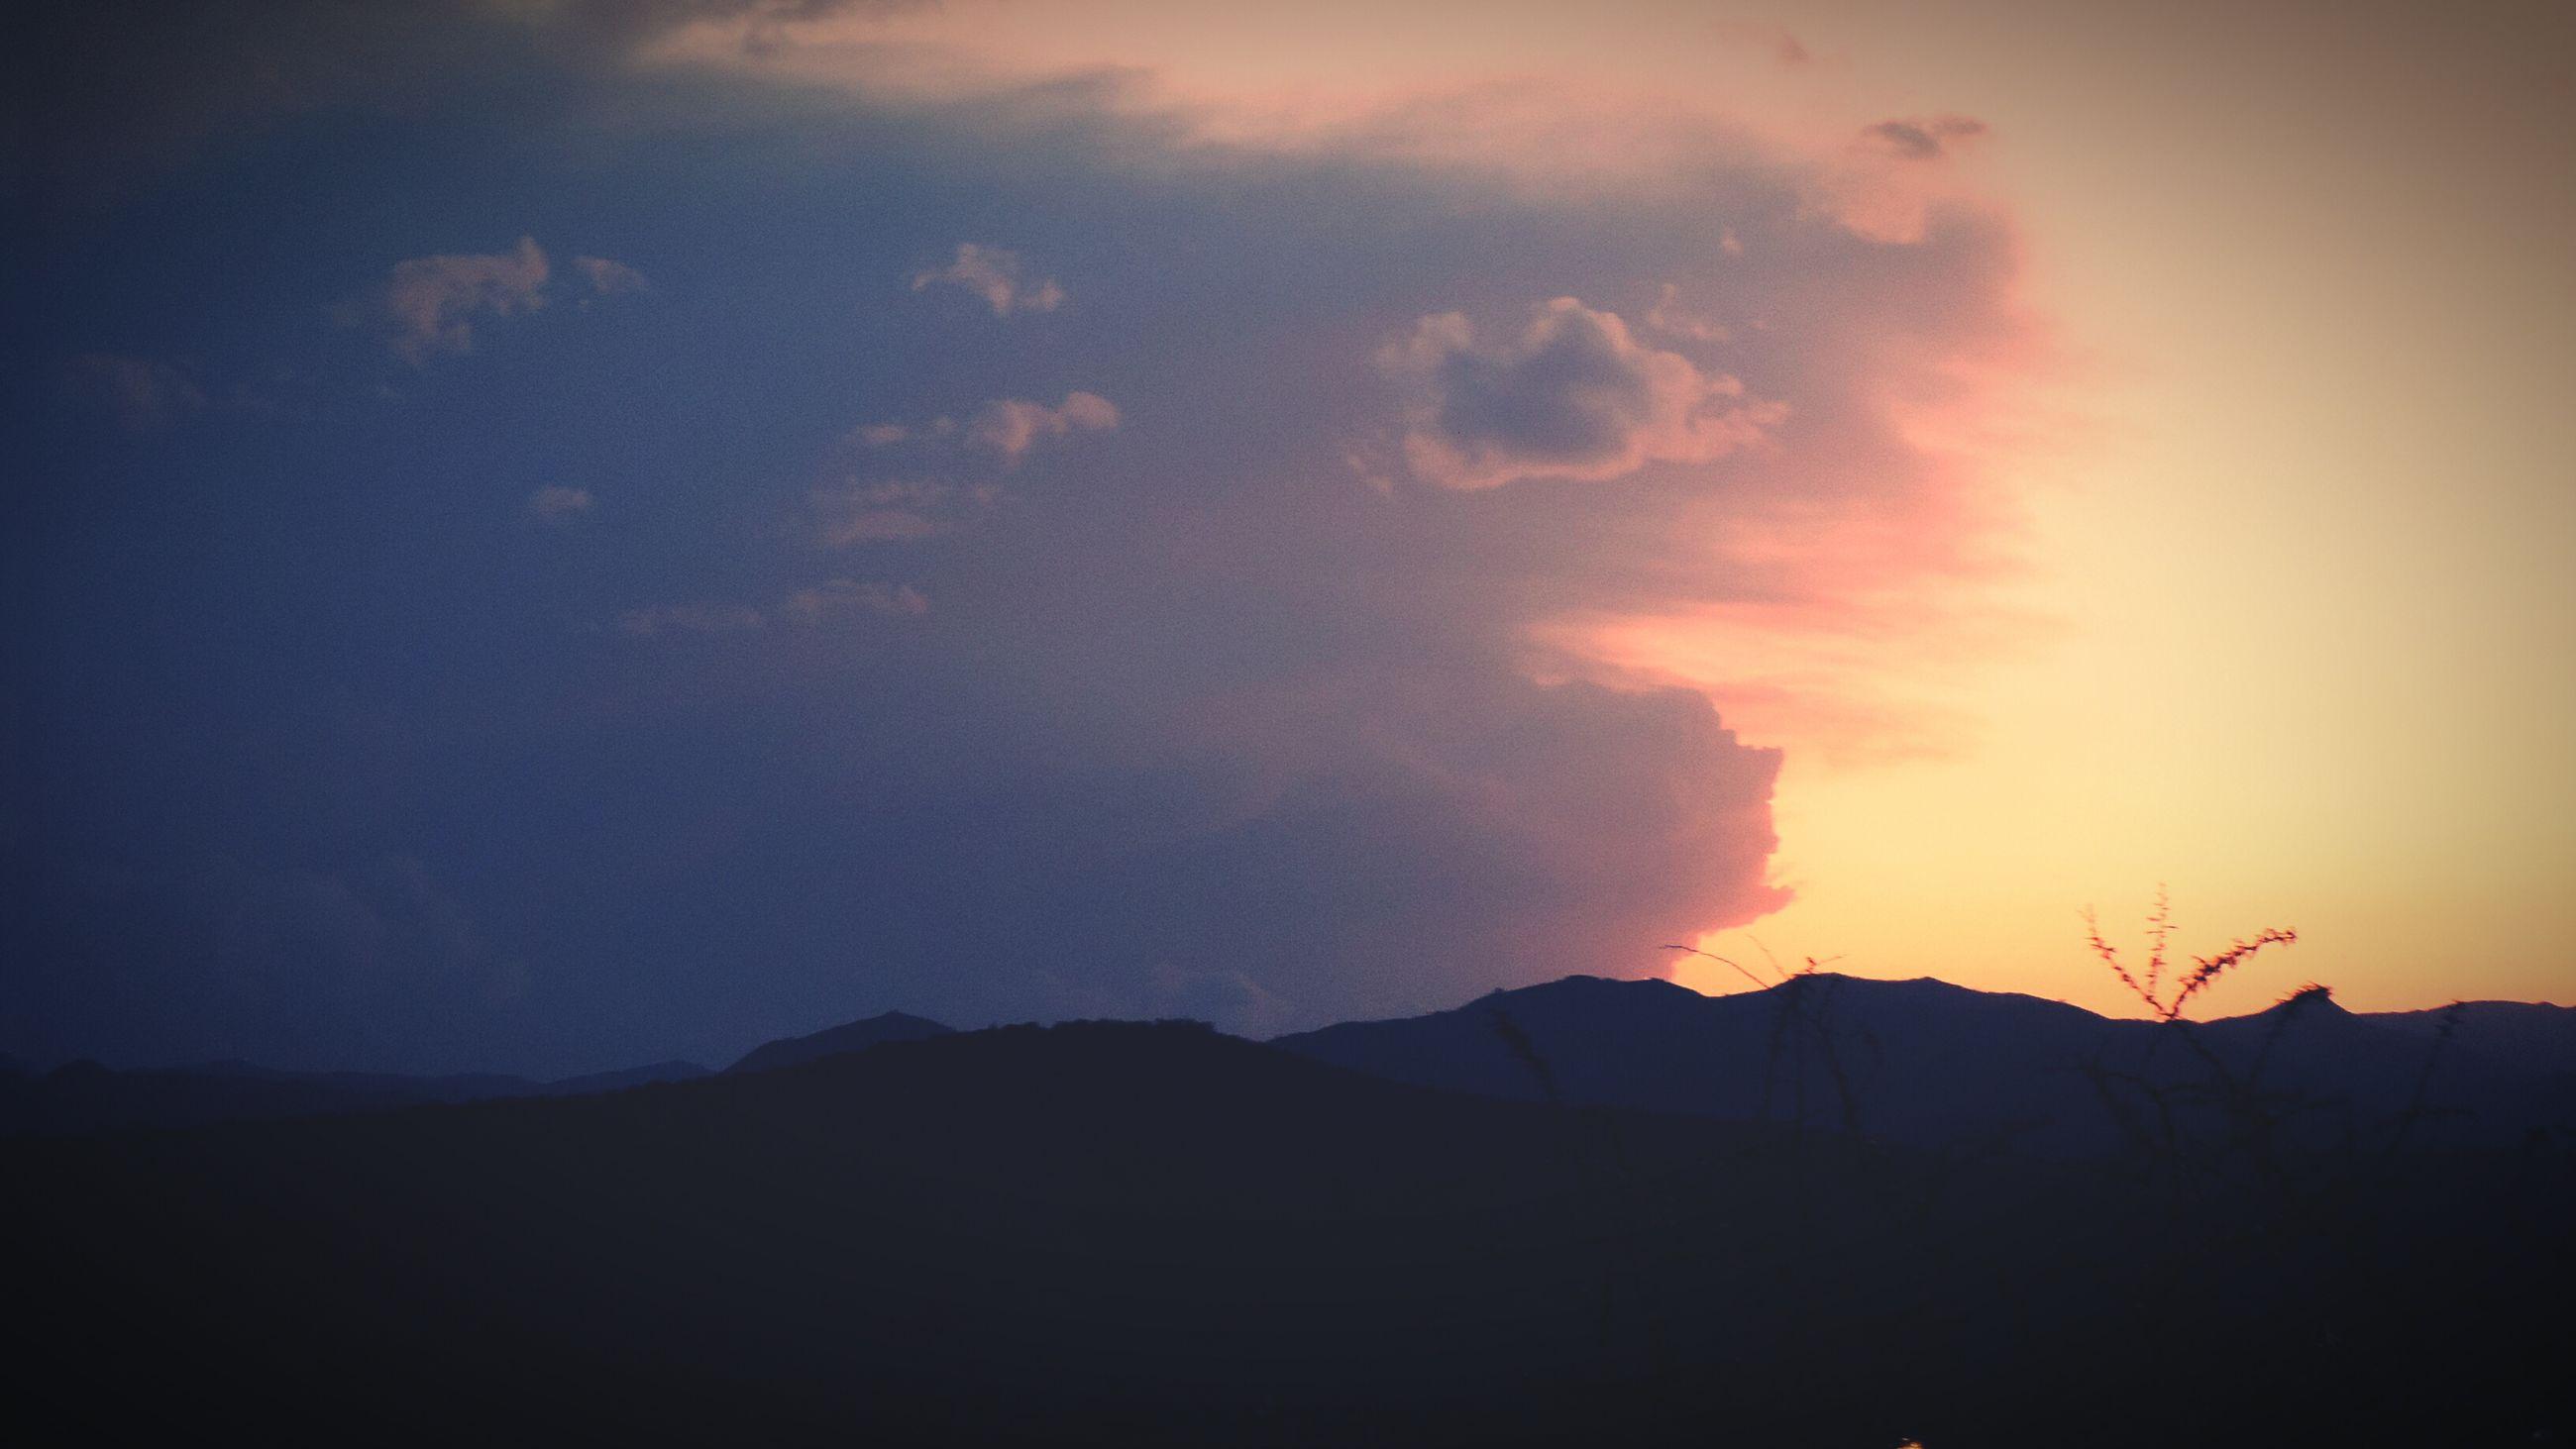 mountain, scenics, sunset, tranquil scene, sky, silhouette, tranquility, beauty in nature, landscape, mountain range, nature, cloud - sky, idyllic, cloud, non-urban scene, orange color, dusk, outdoors, majestic, remote